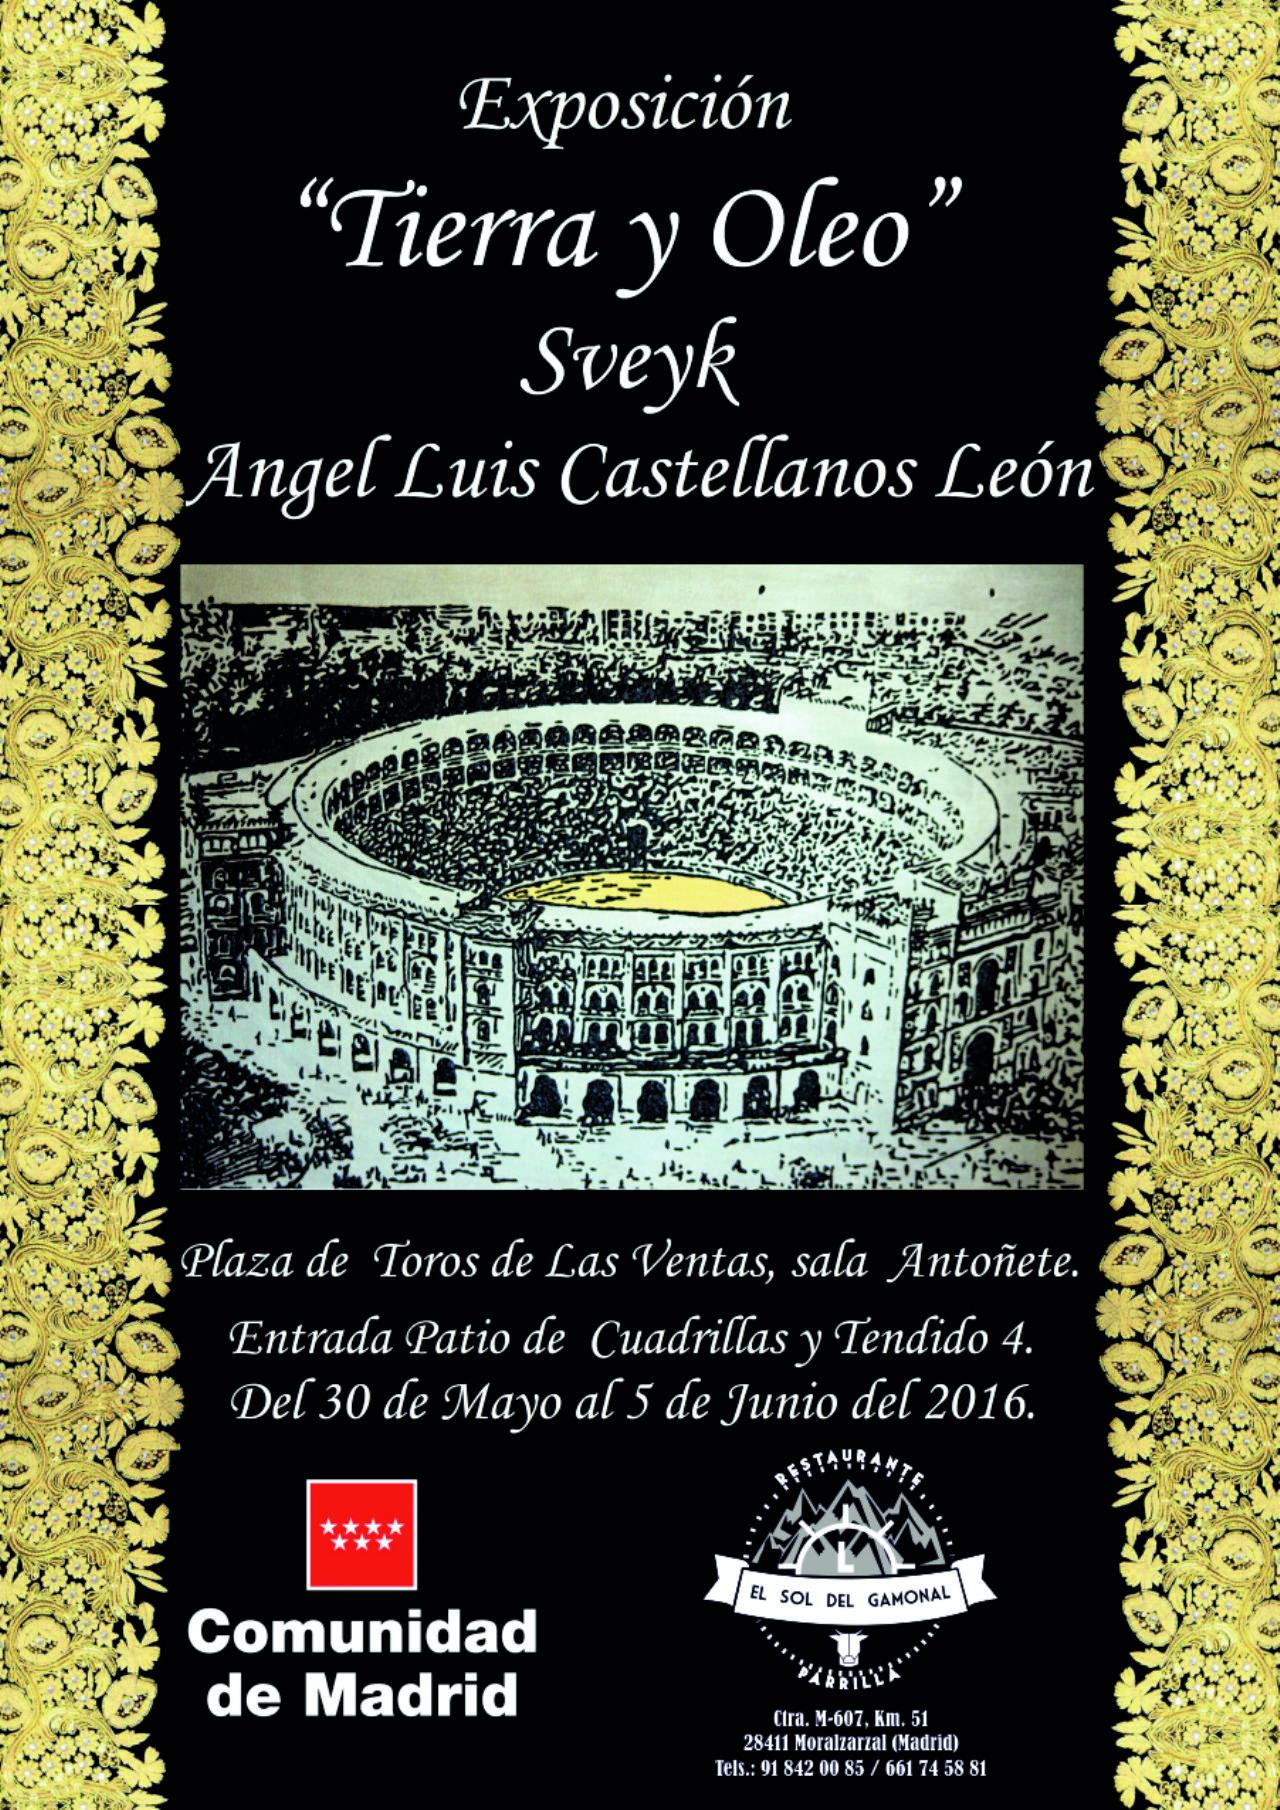 CARTEL SVEYK EXPOSICION 17-5-16 (1)